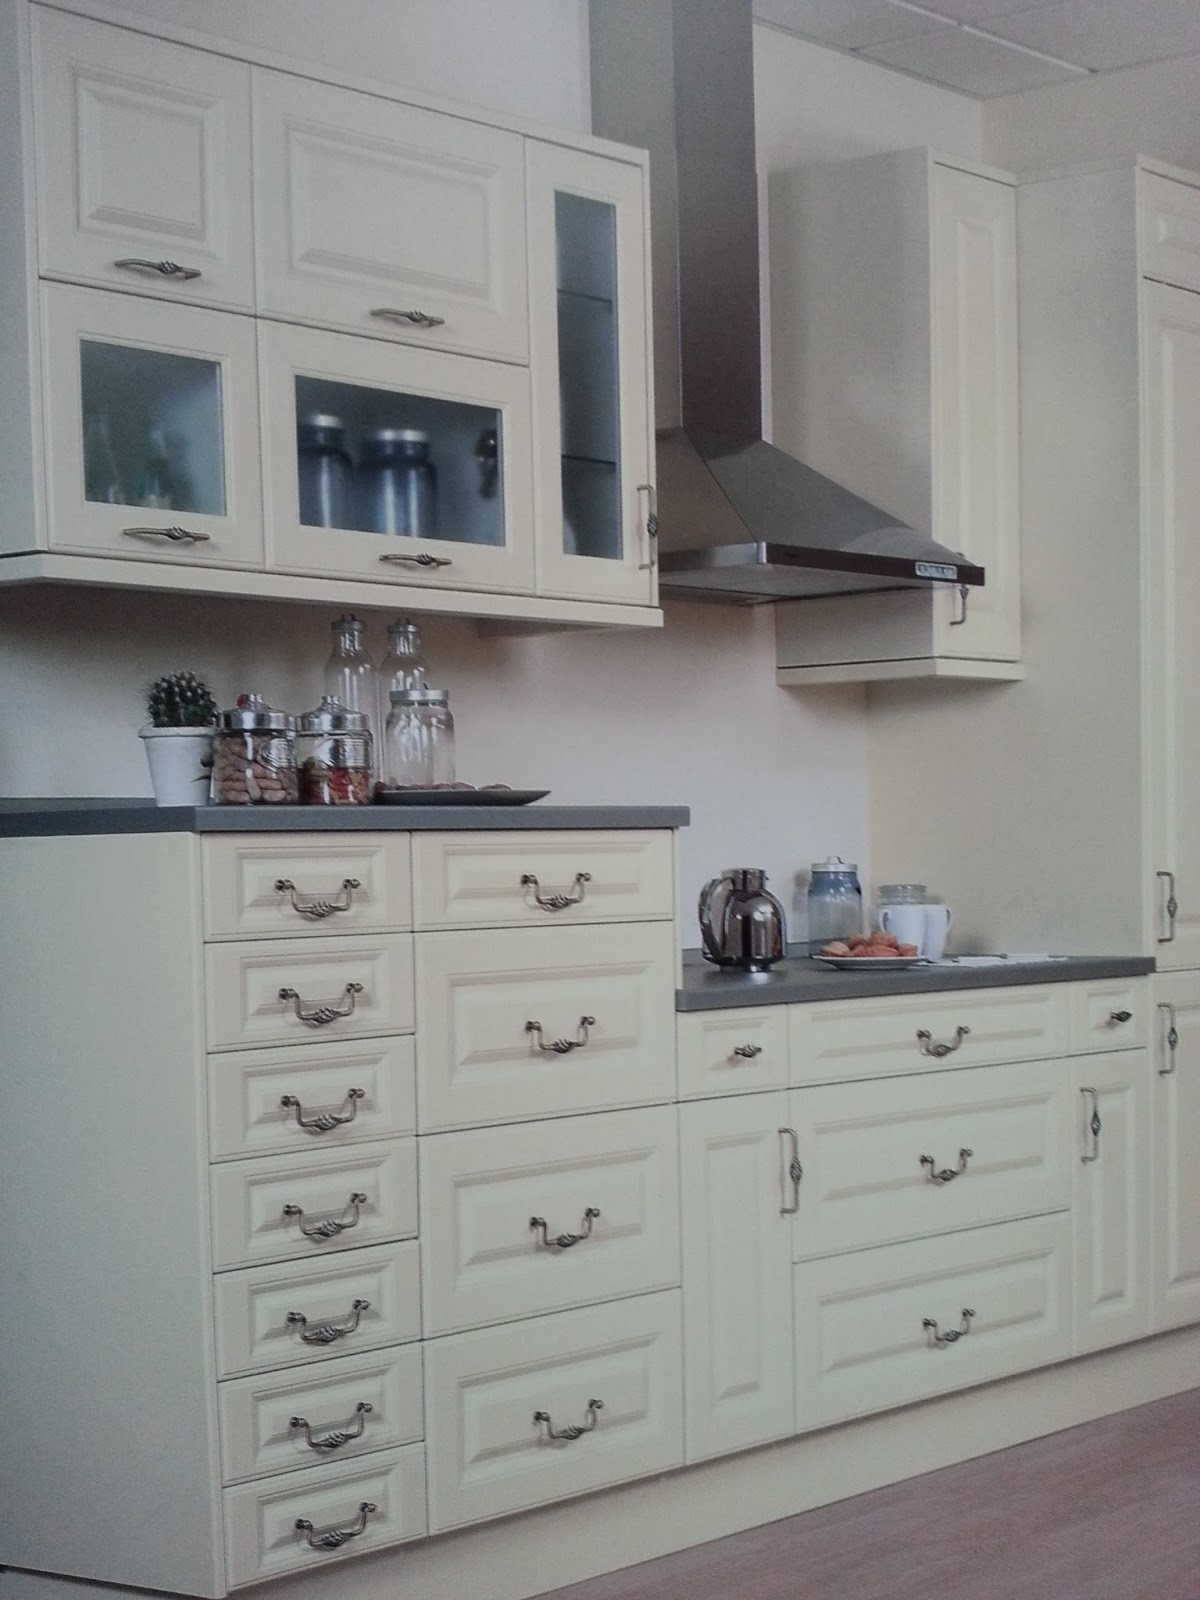 Plathoo dise o de cocinas y ba os 3d cocinas con tirador - Diseno de cocinas y banos ...